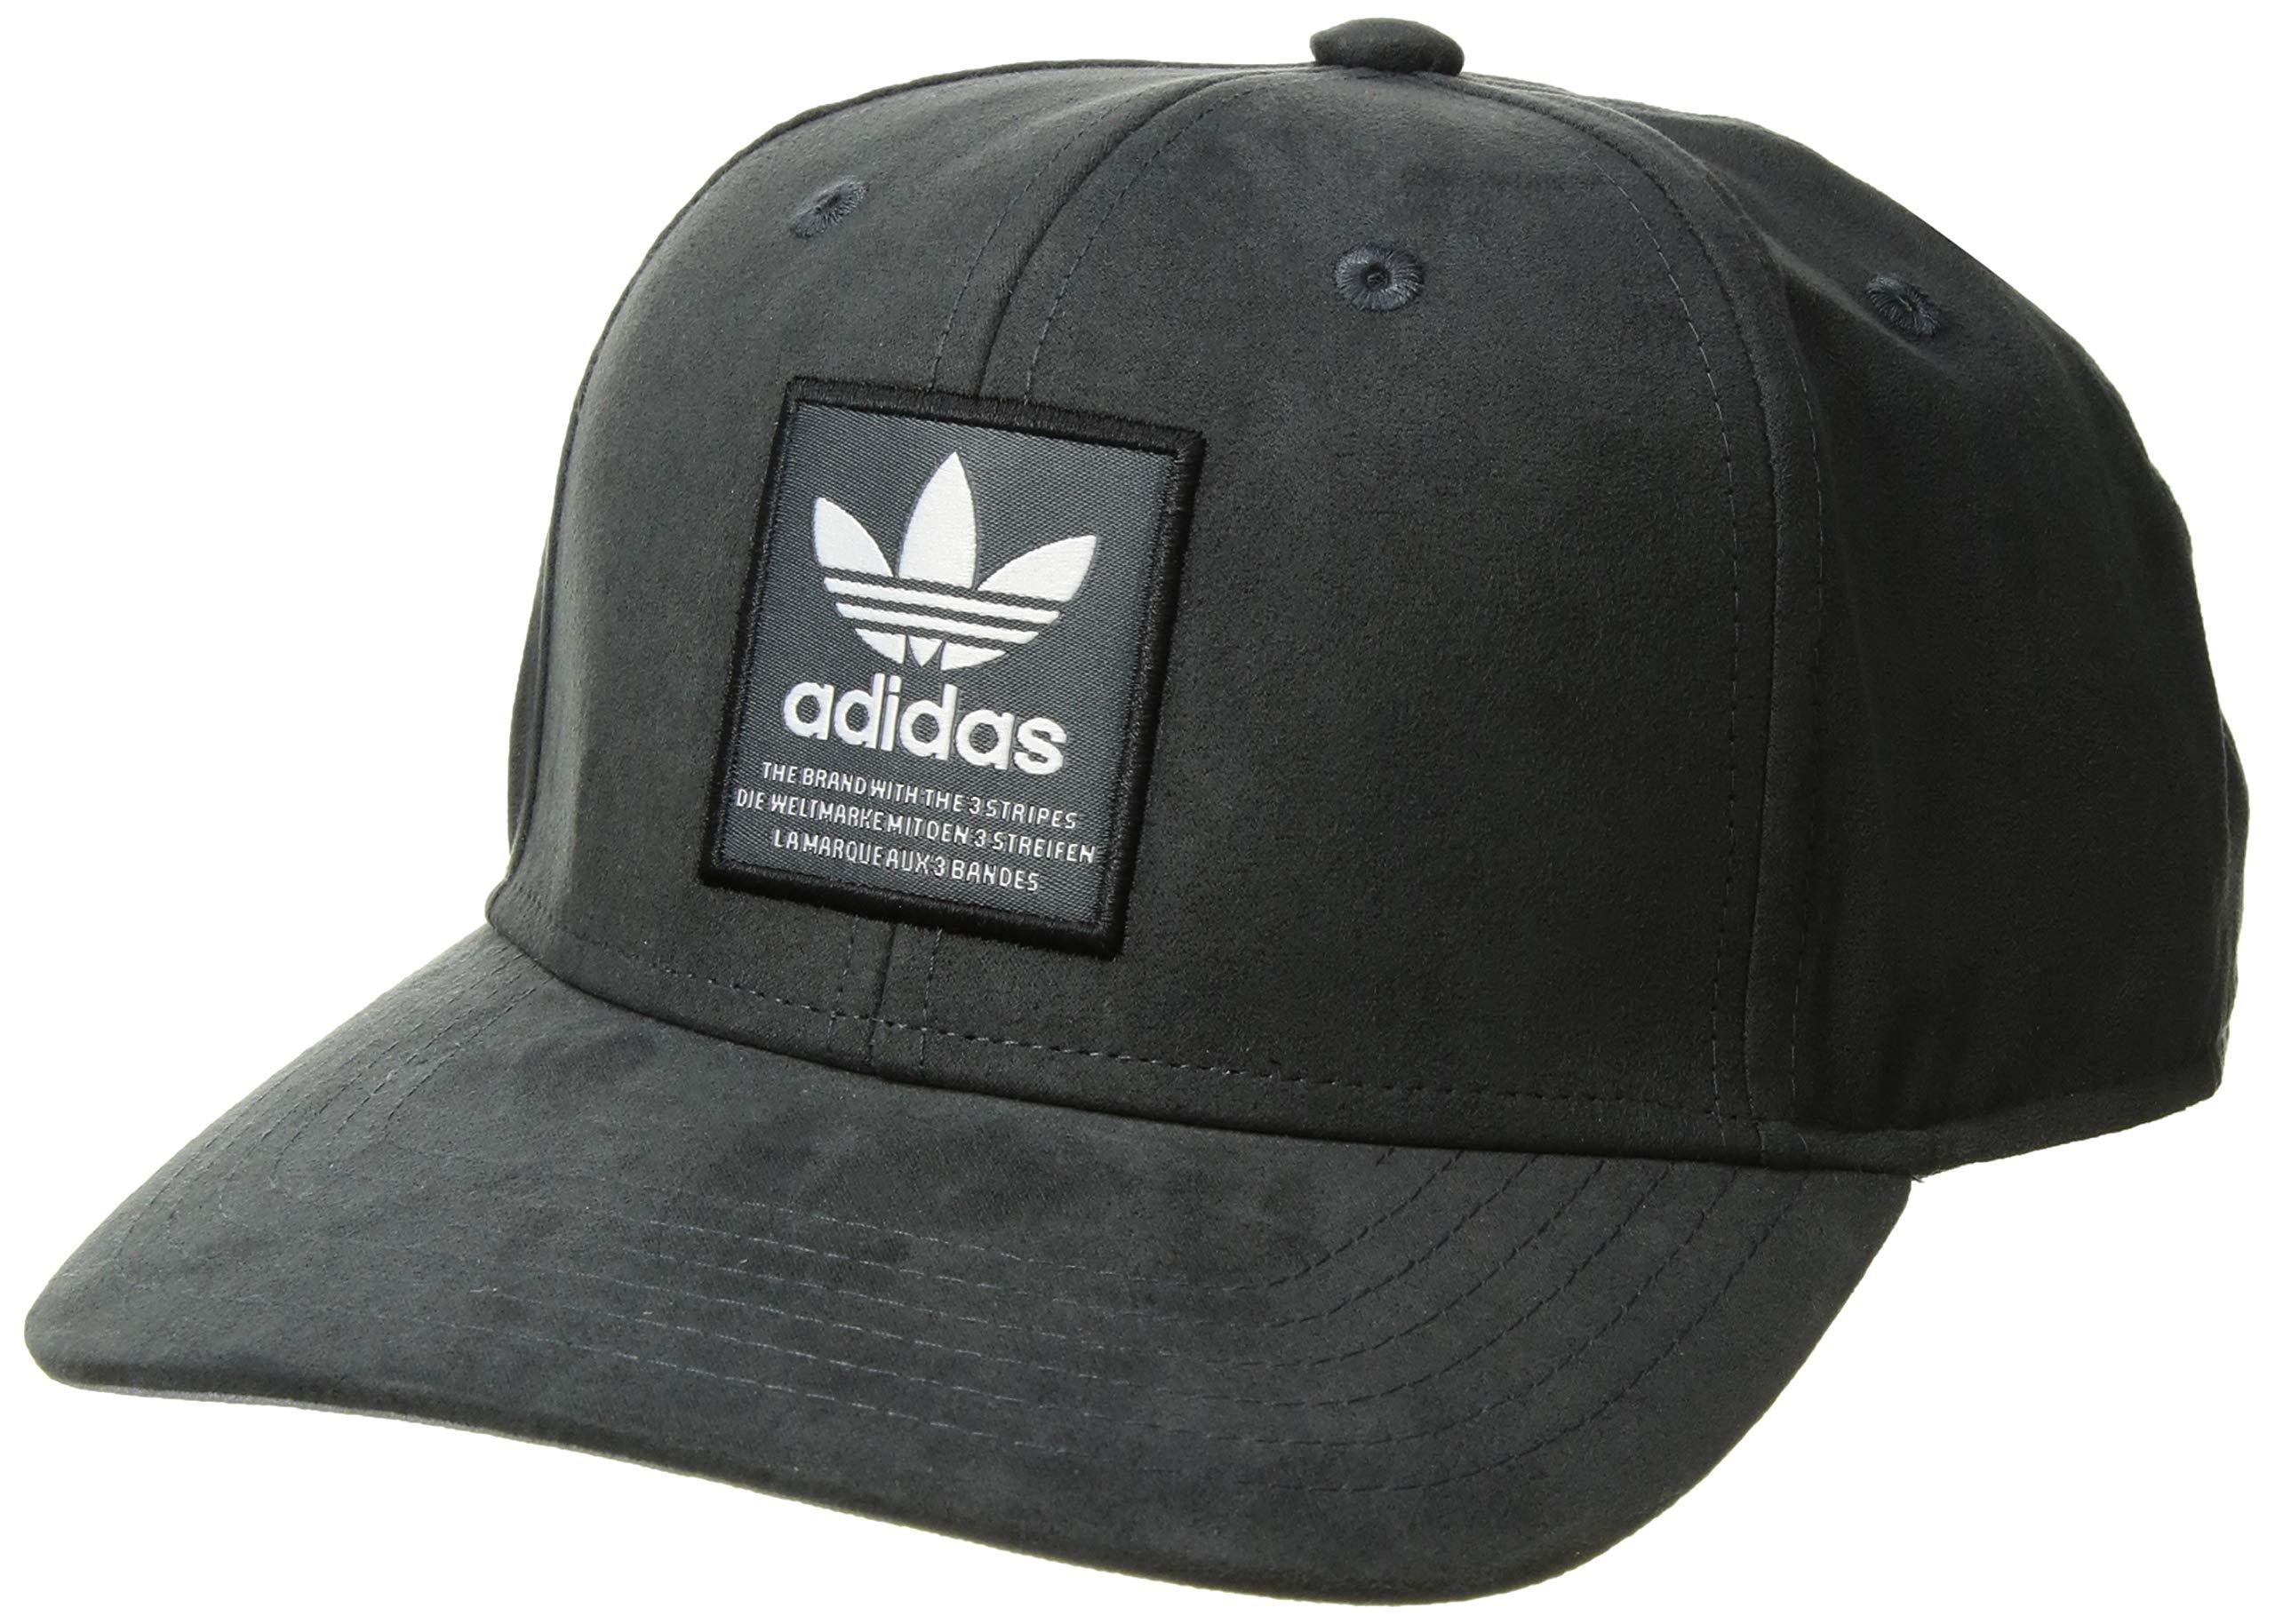 0adede59f52c7f Galleon - Adidas Men's Originals Patch Trucker Structured Cap, Onix/white/ black, One Size